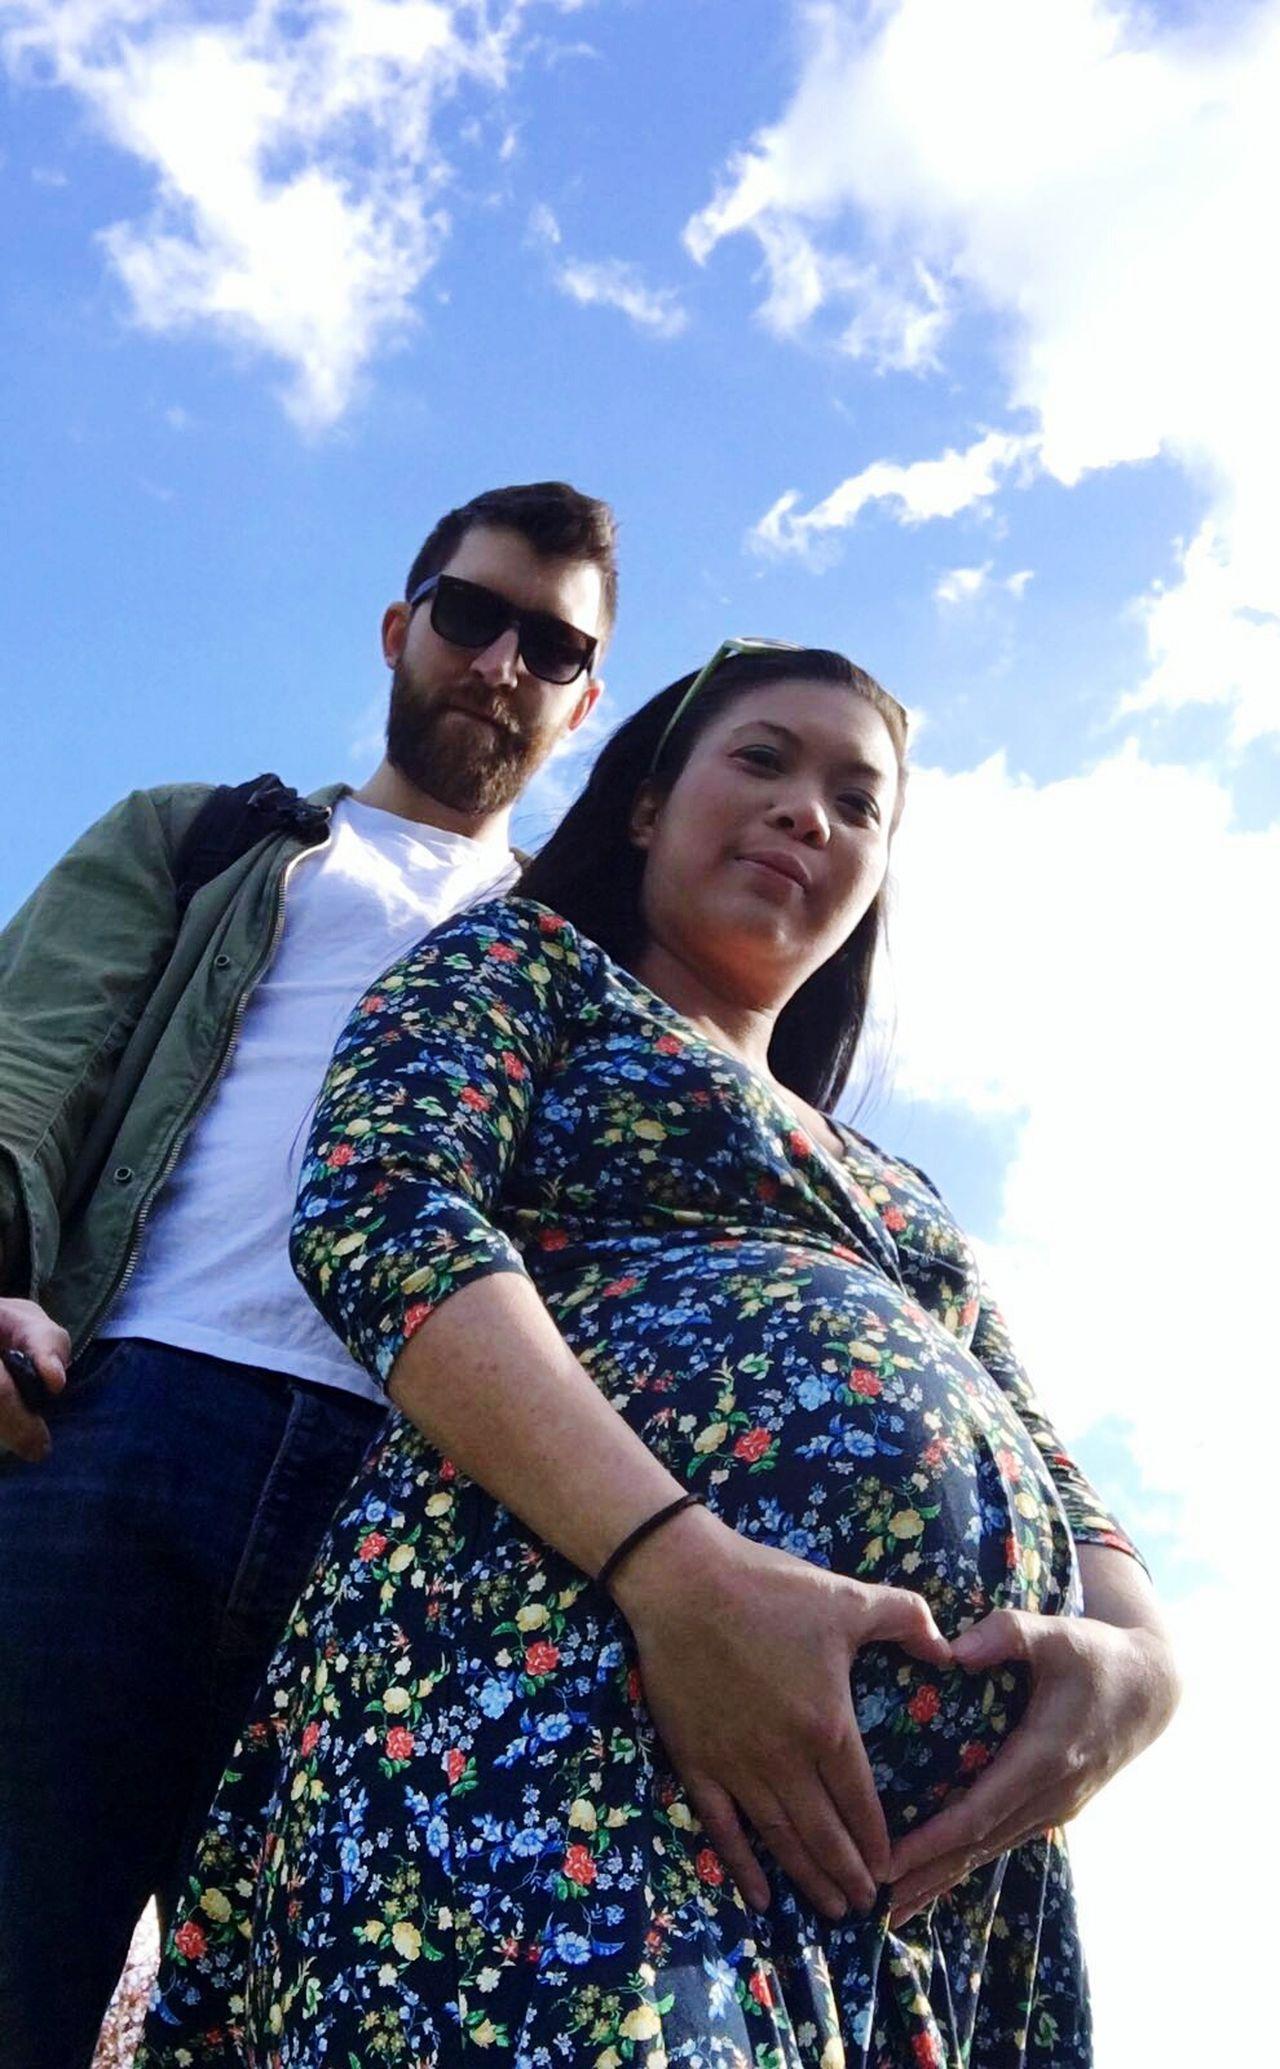 DIY Bump Shoot Pregnant Pregnancy Bump Shoot Lais Little Life Laislittlelife Maternityphotos Polesden Lacey Maternity Shoot Maternity